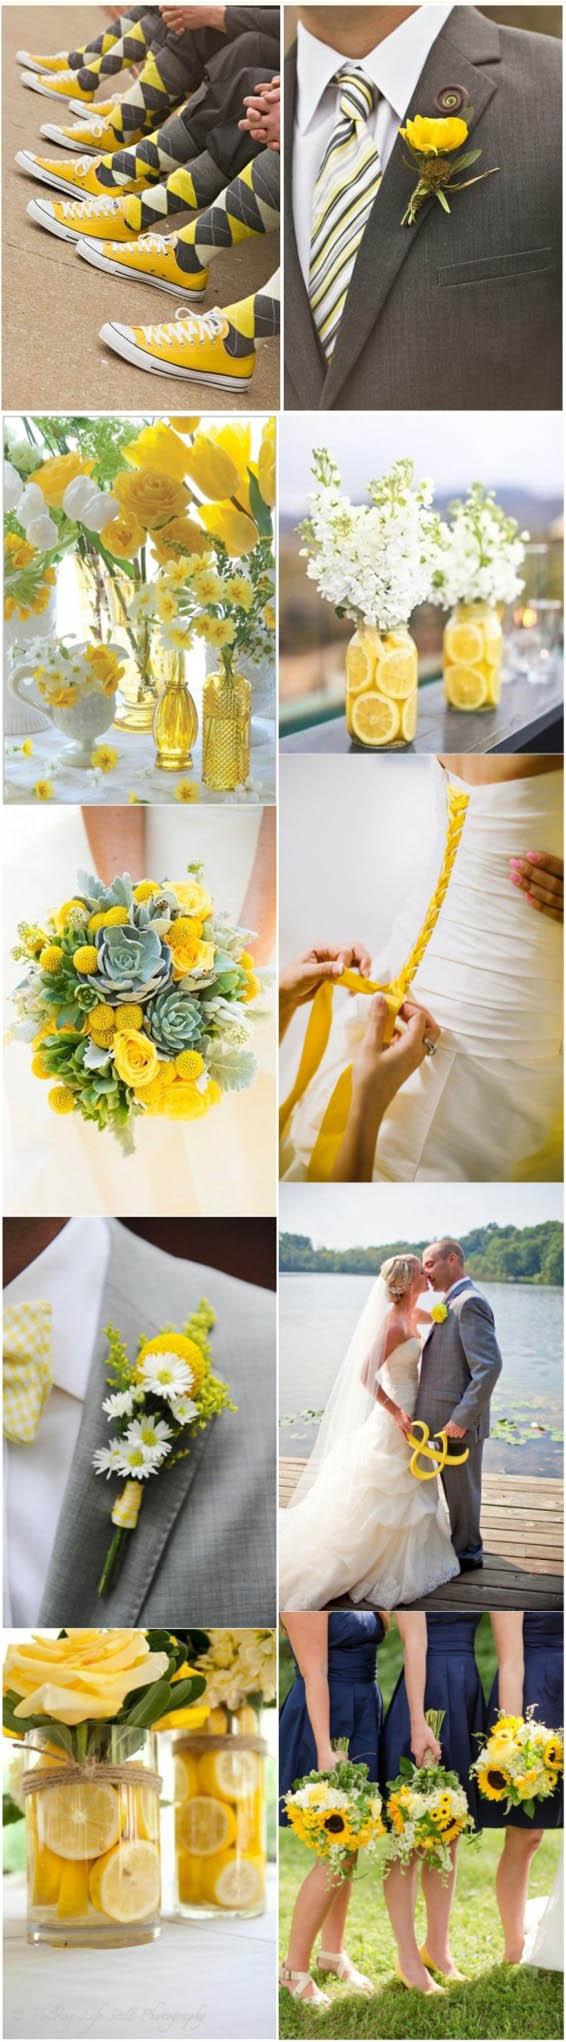 Cozy Ideas Spring Wedding Colors Combinations 2017 Spring Wedding Colors Yellow 2017 Primrose Yellow Wedding Ideas 2017 Spring Wedding Color wedding Spring Wedding Colors